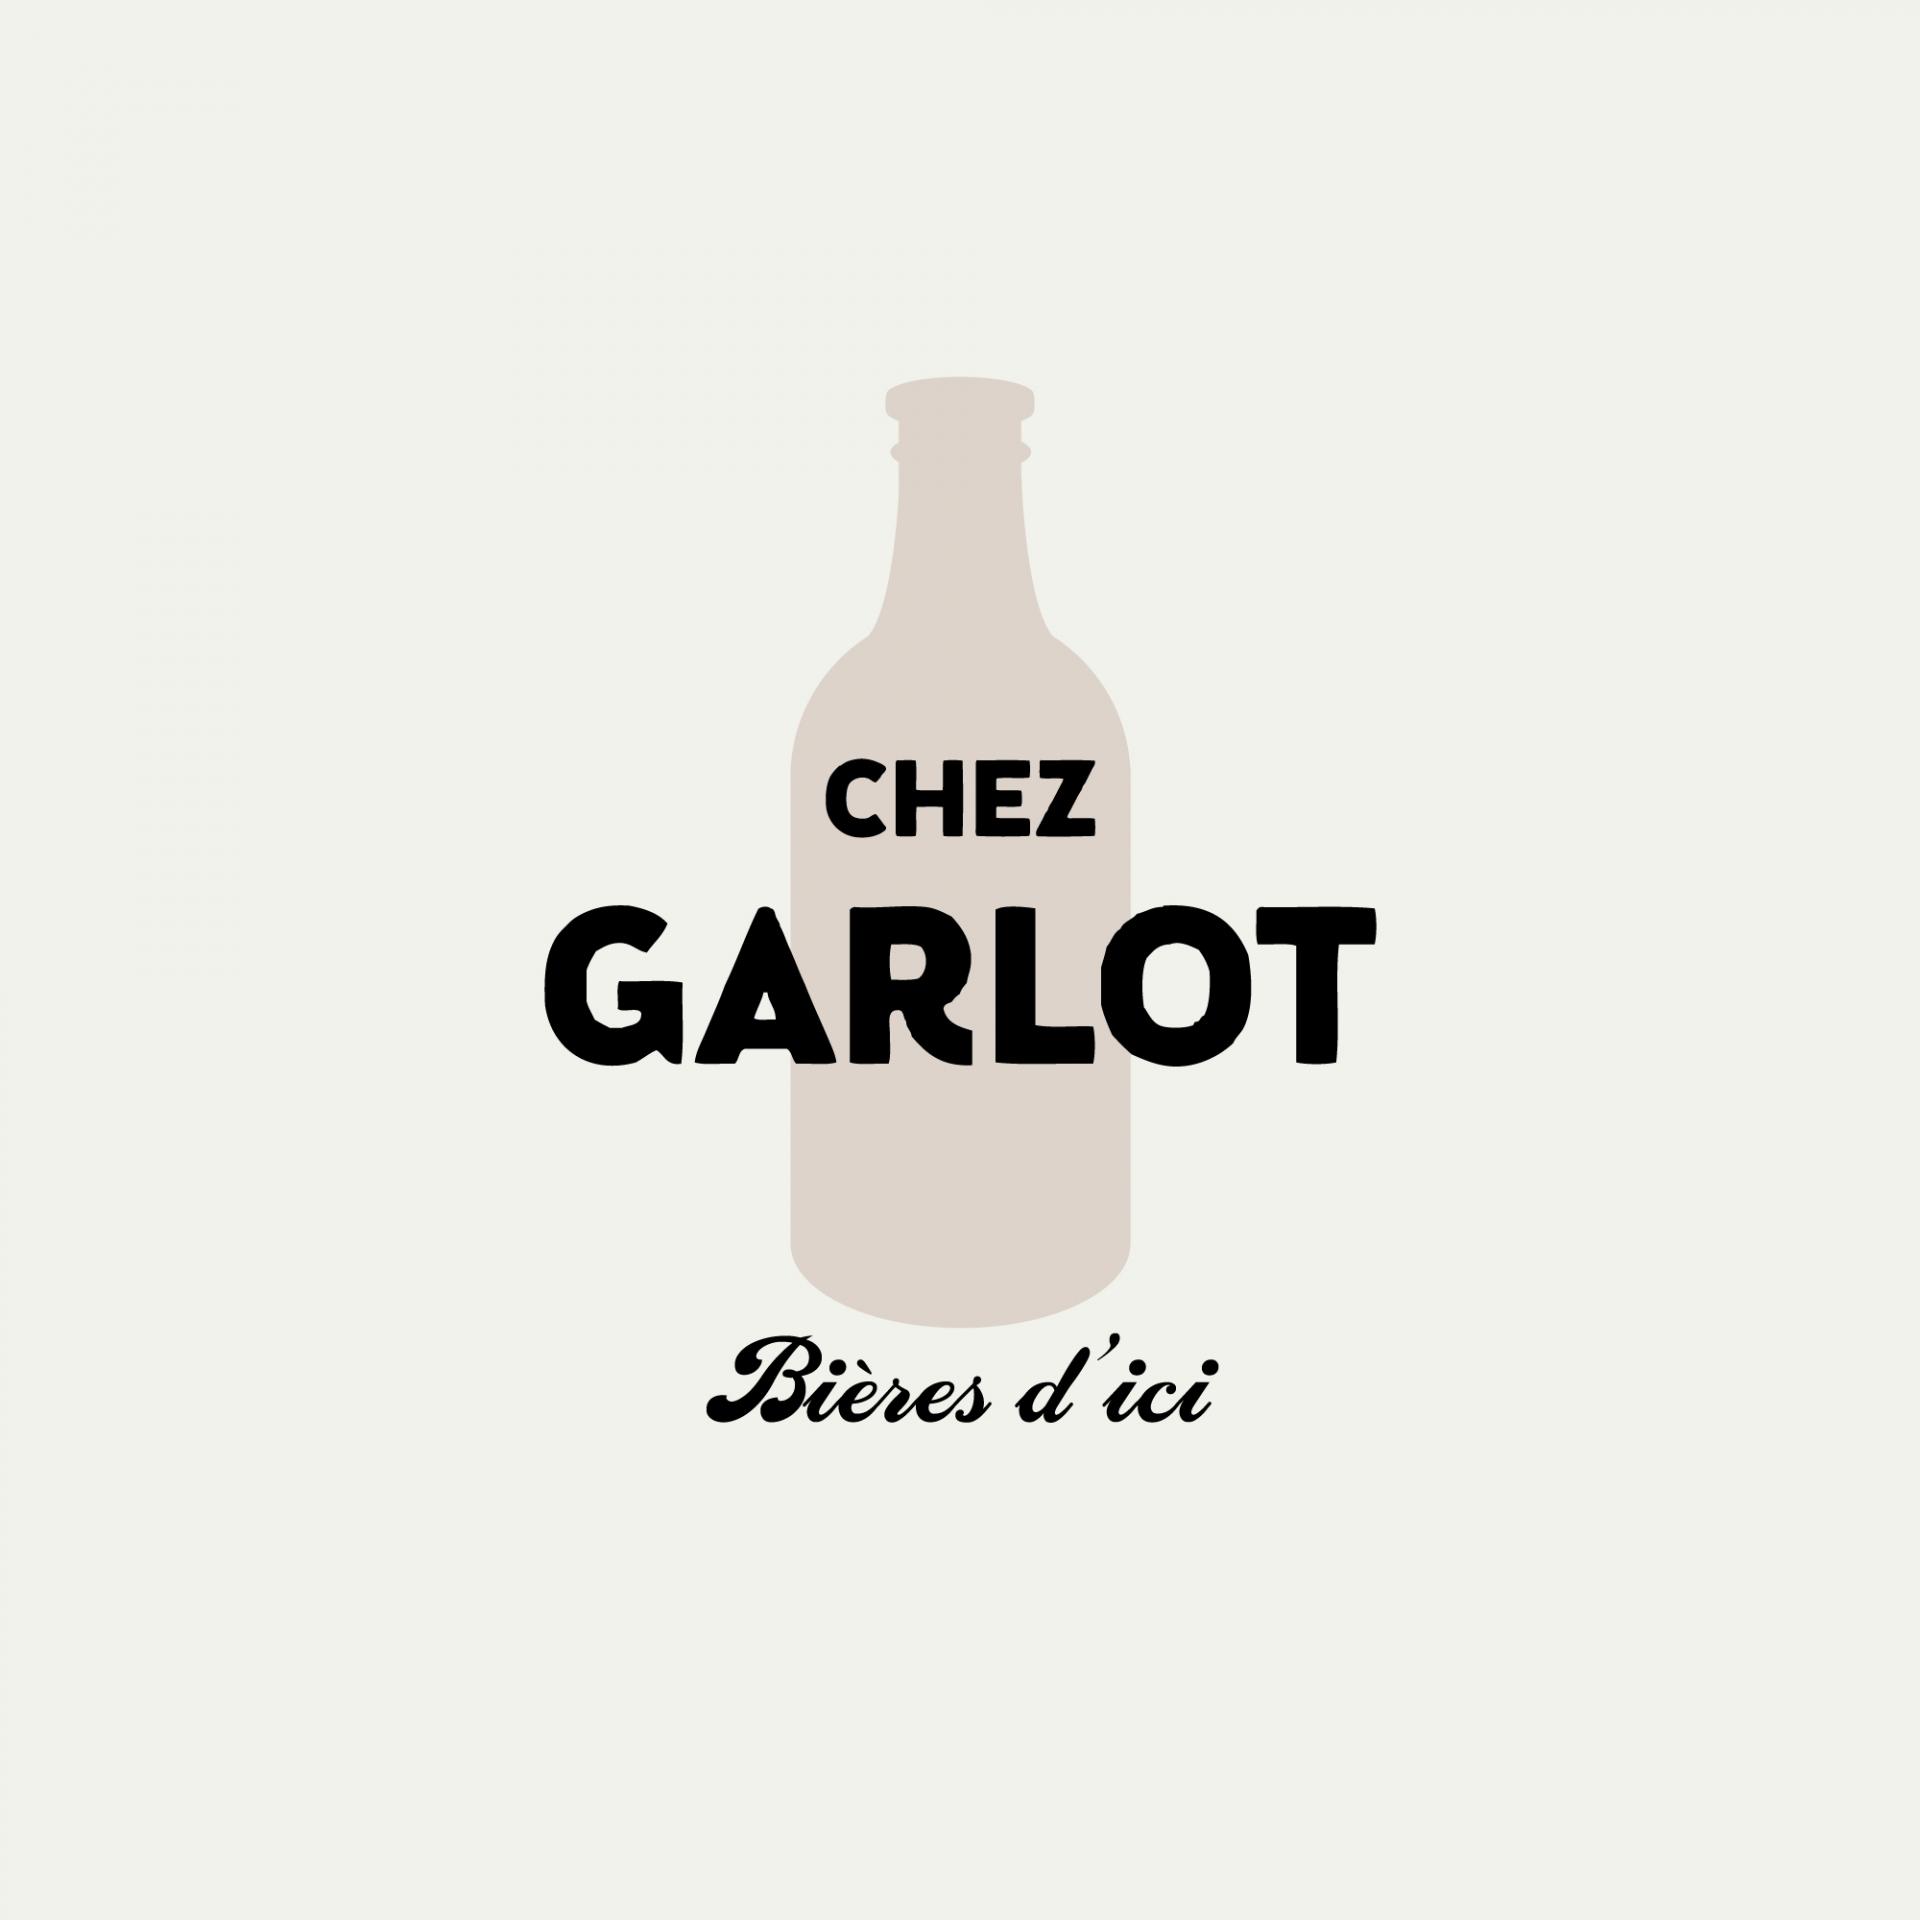 Chez Garlot